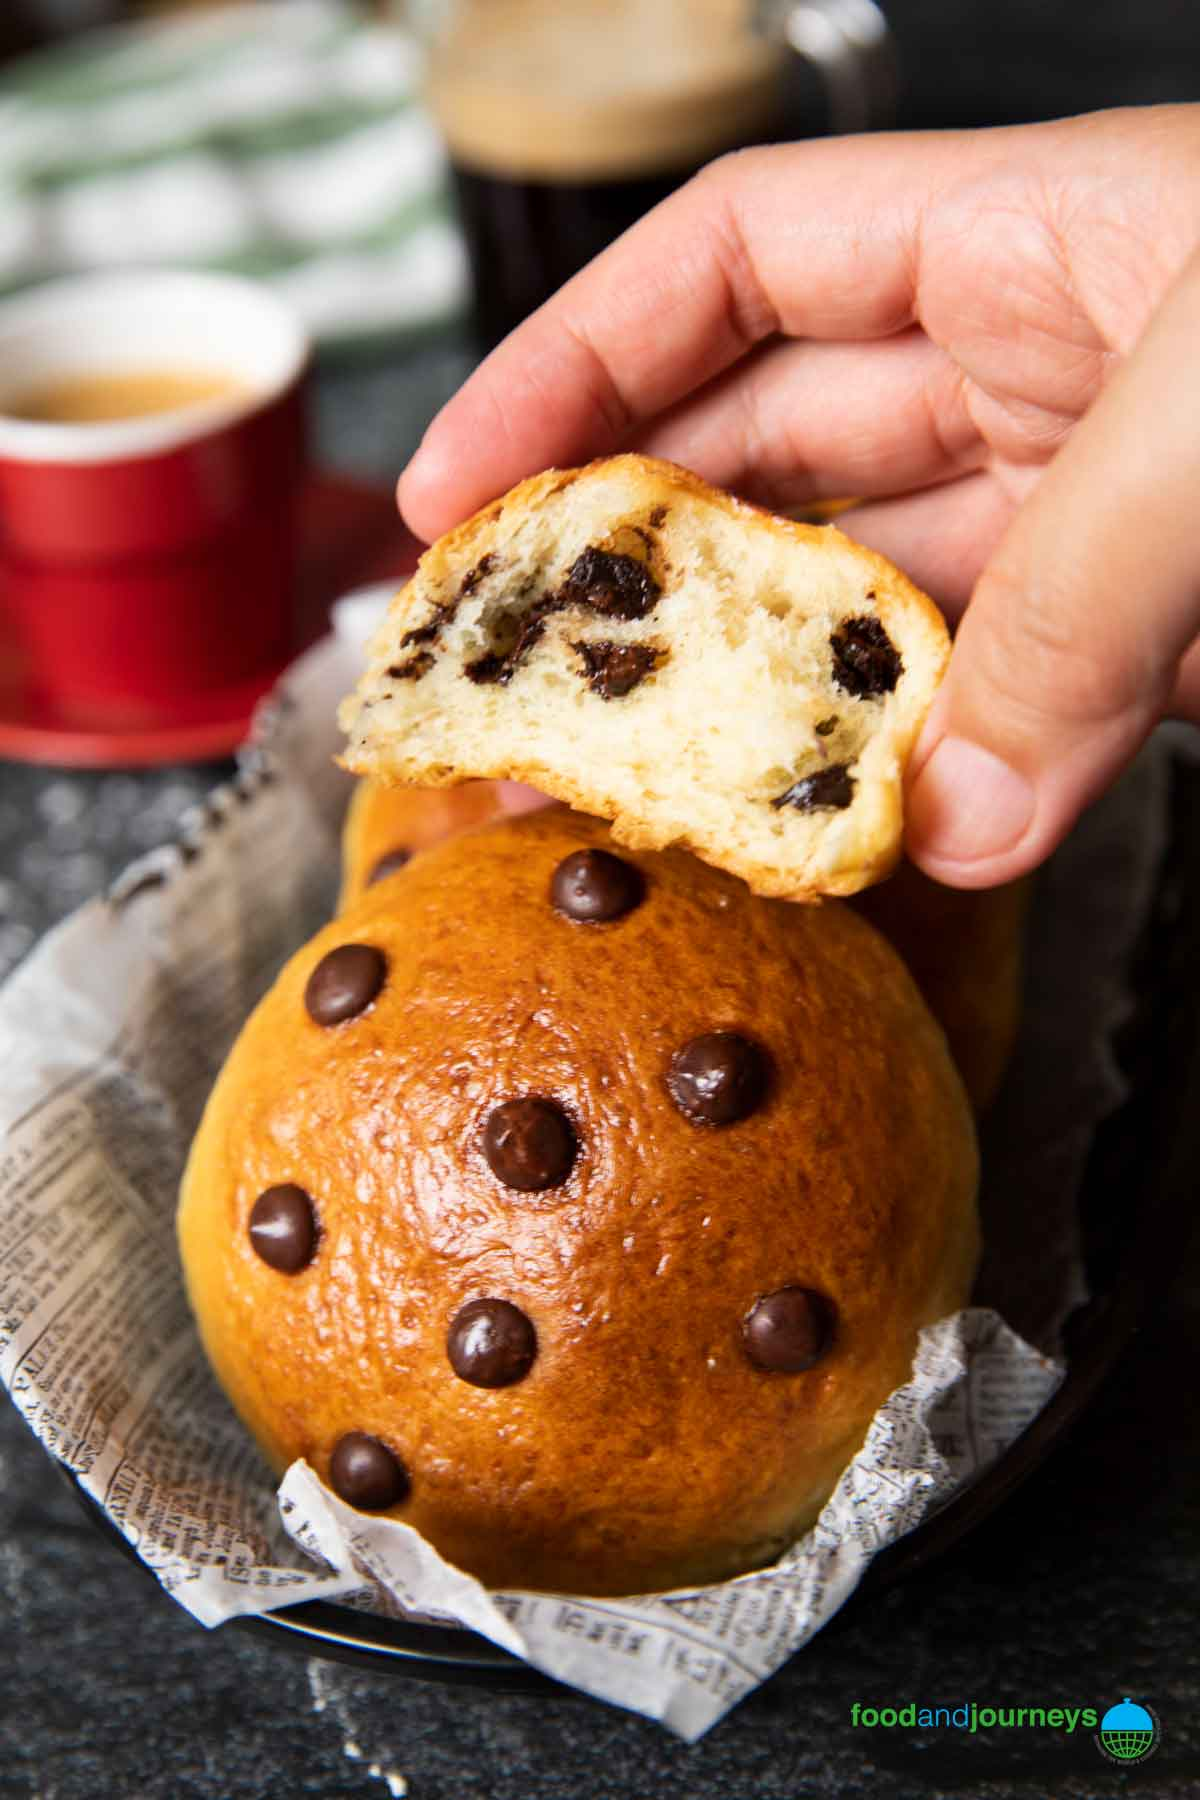 A shot of a half eaten chocolate bun, highlighting the texture of the roll.